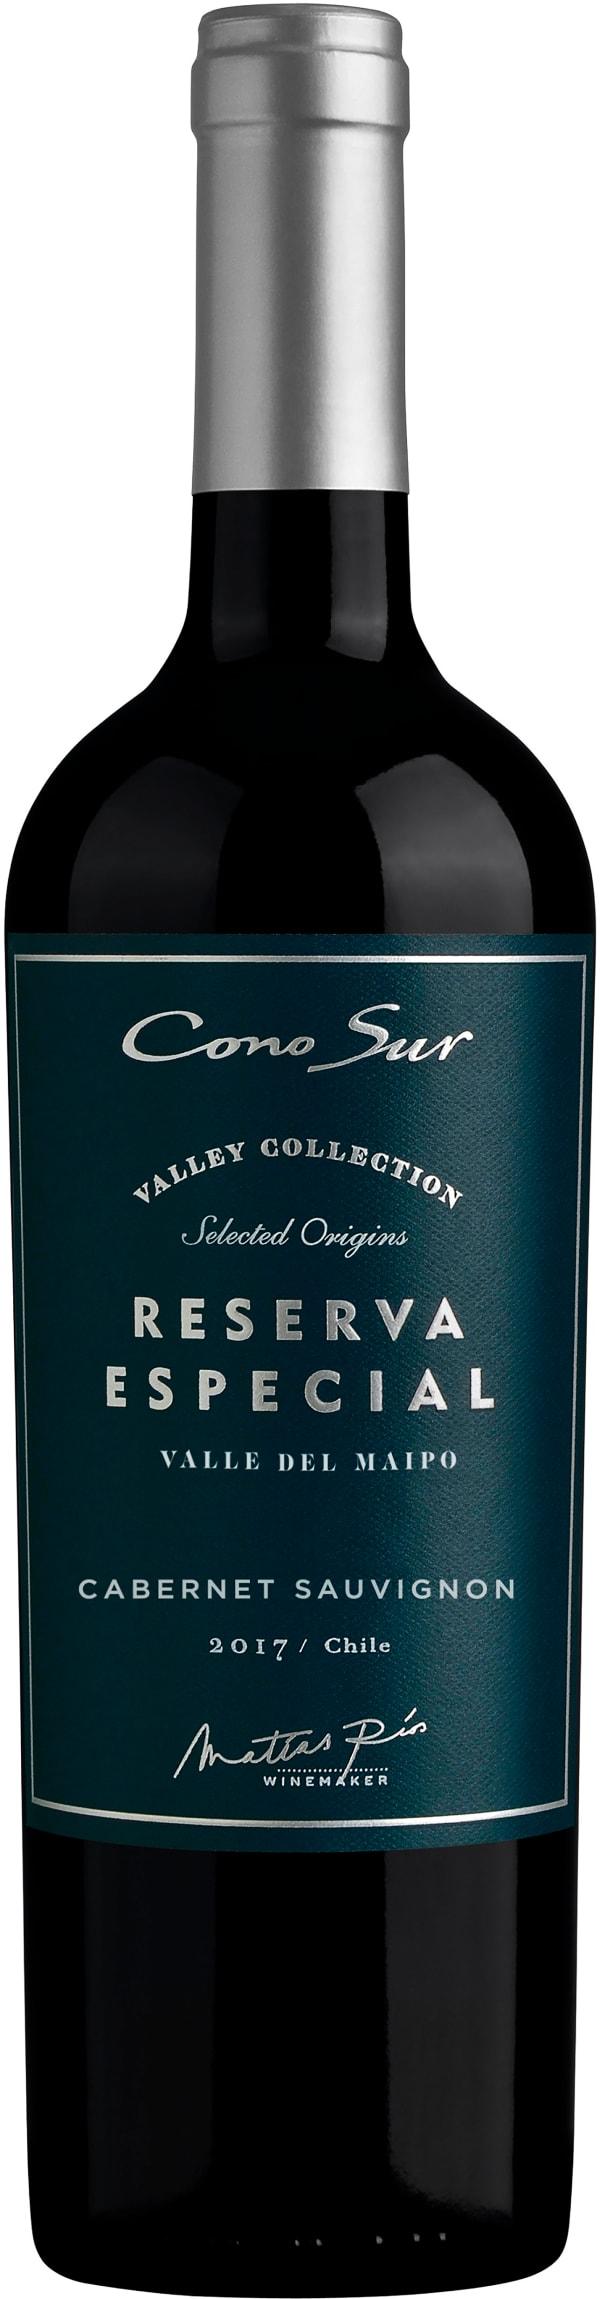 Cono Sur Reserva Especial Cabernet Sauvignon 2017